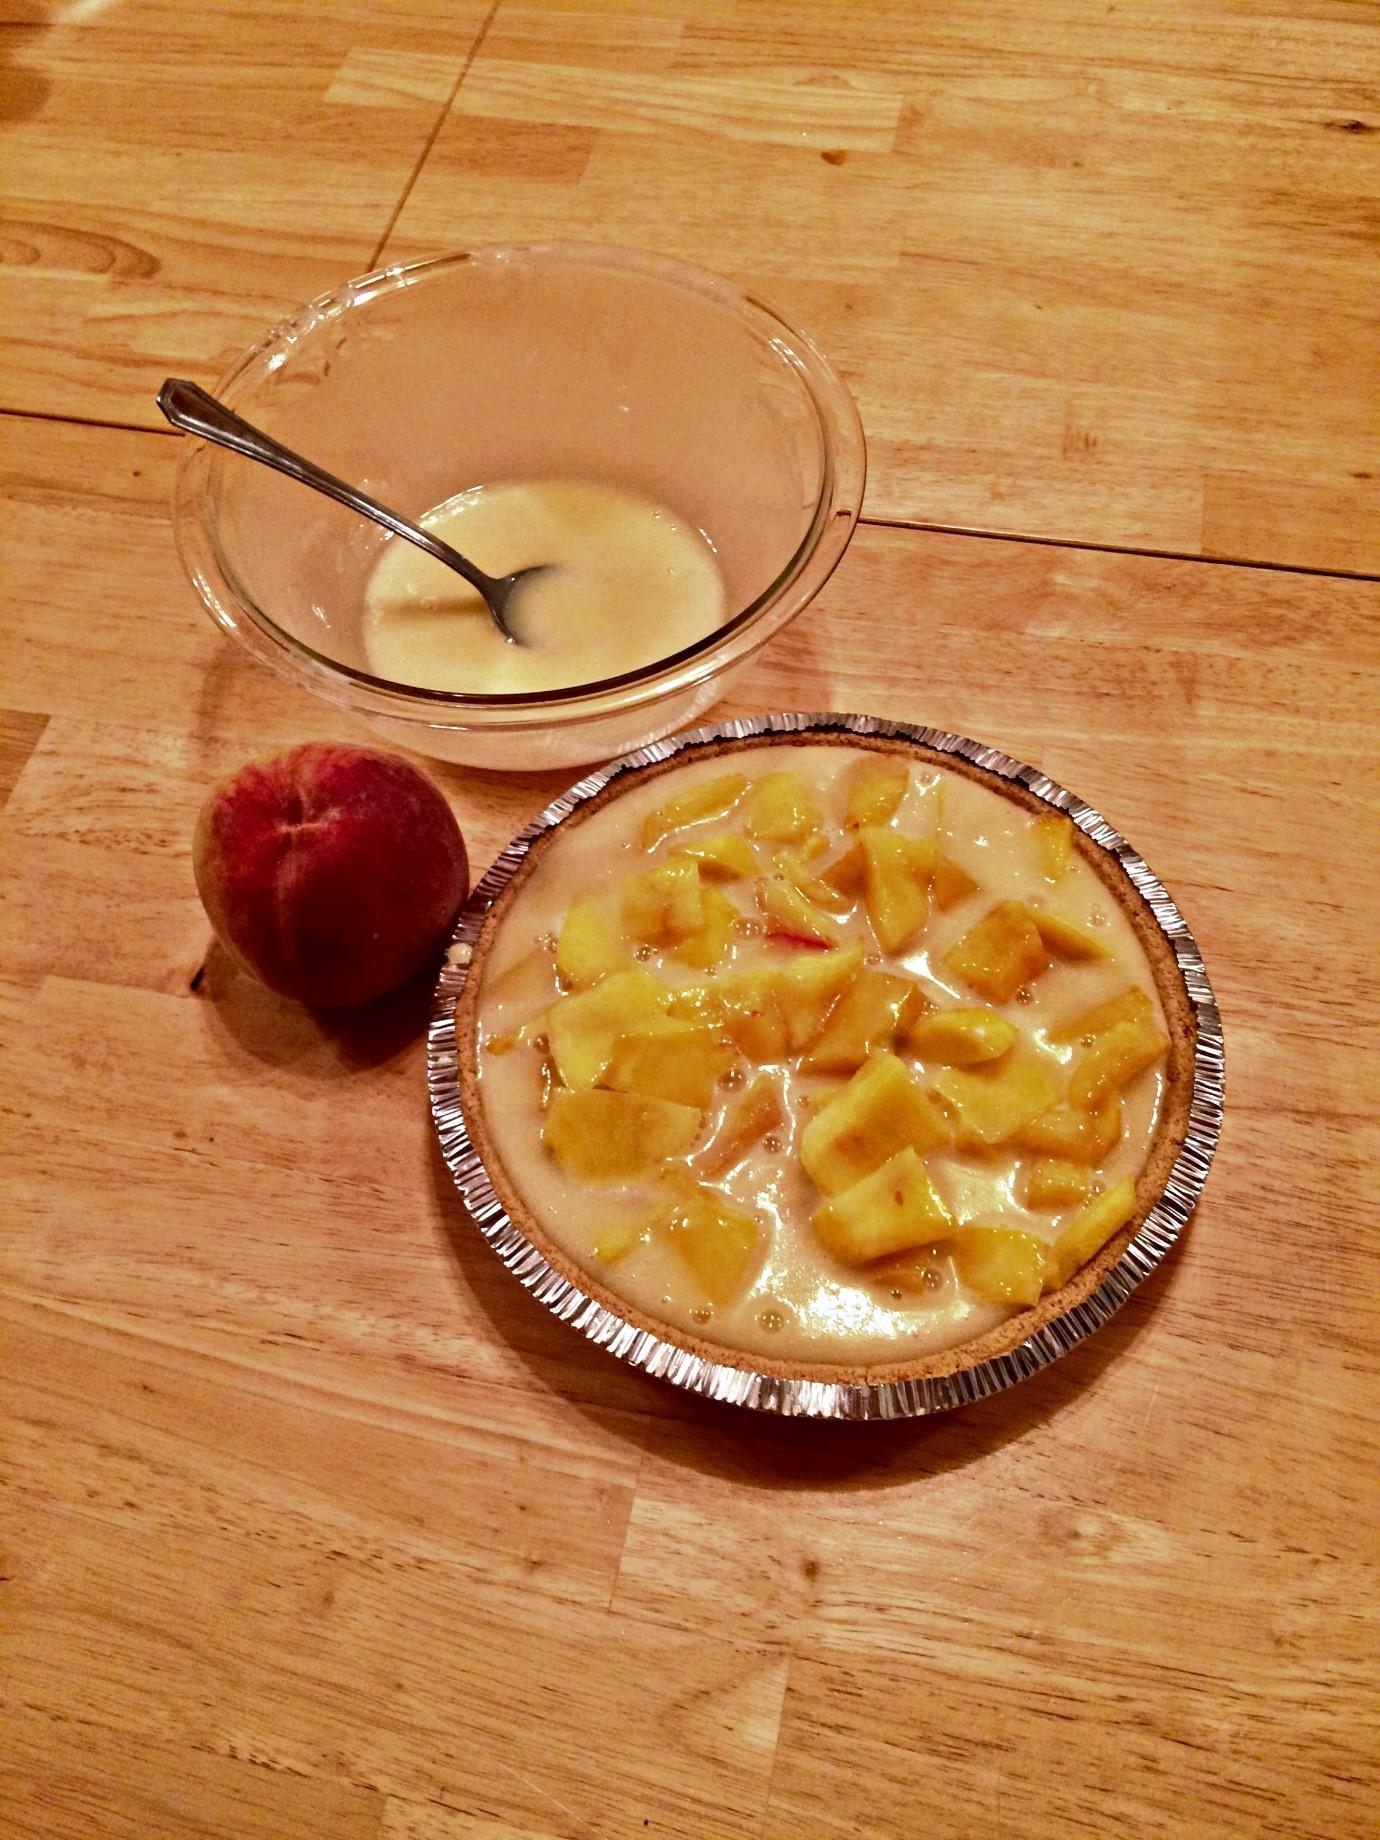 Peaches and cream pie in process